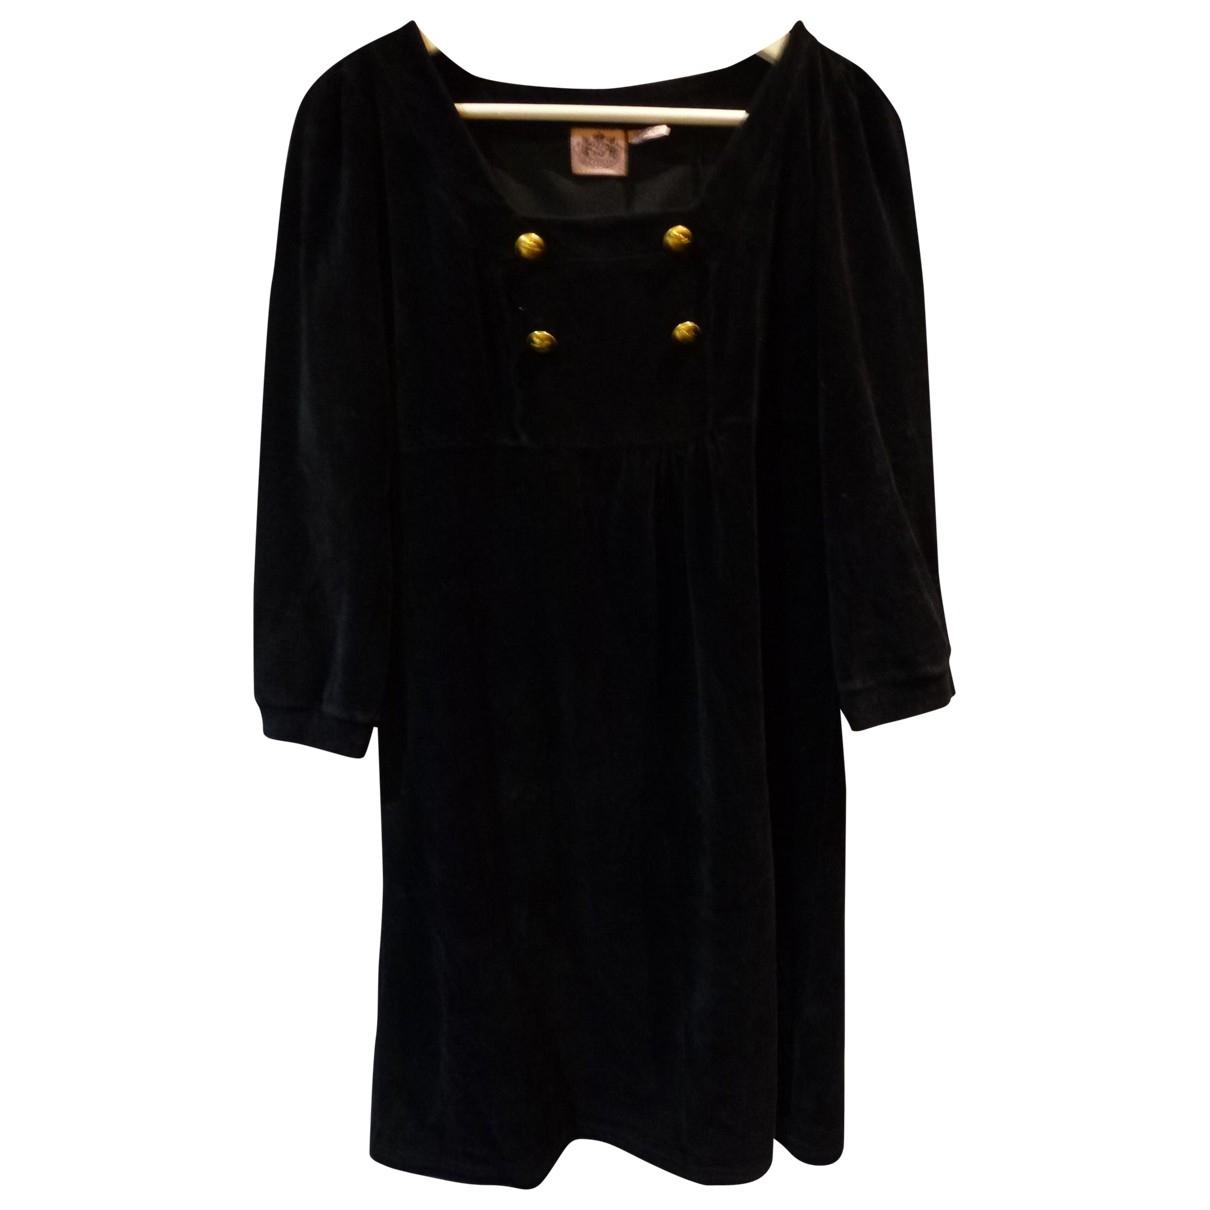 Vestido midi Juicy Couture